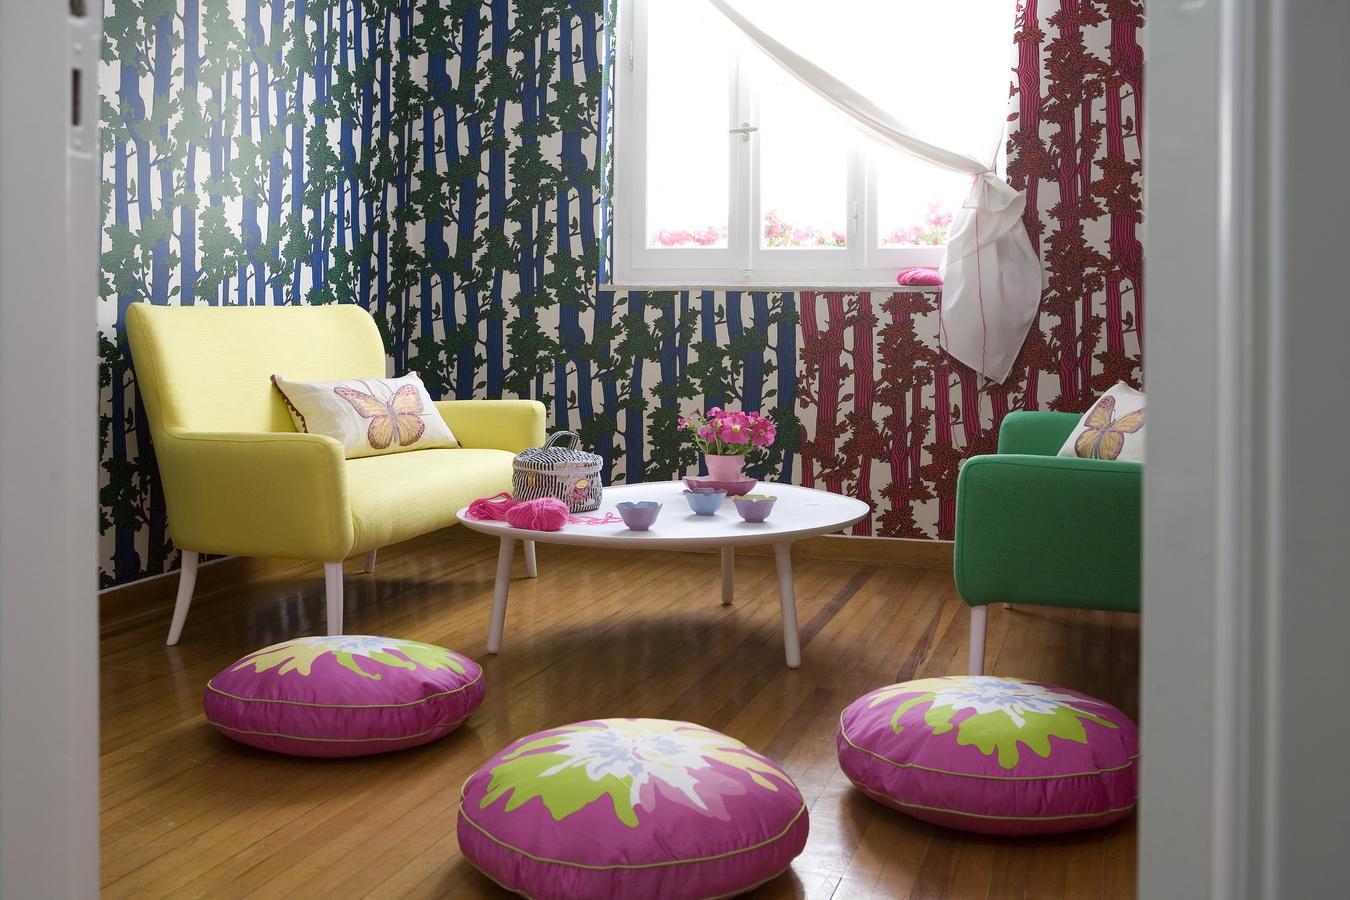 interior-design_simeio-44-by-varangis_hara-kontaxaki_03